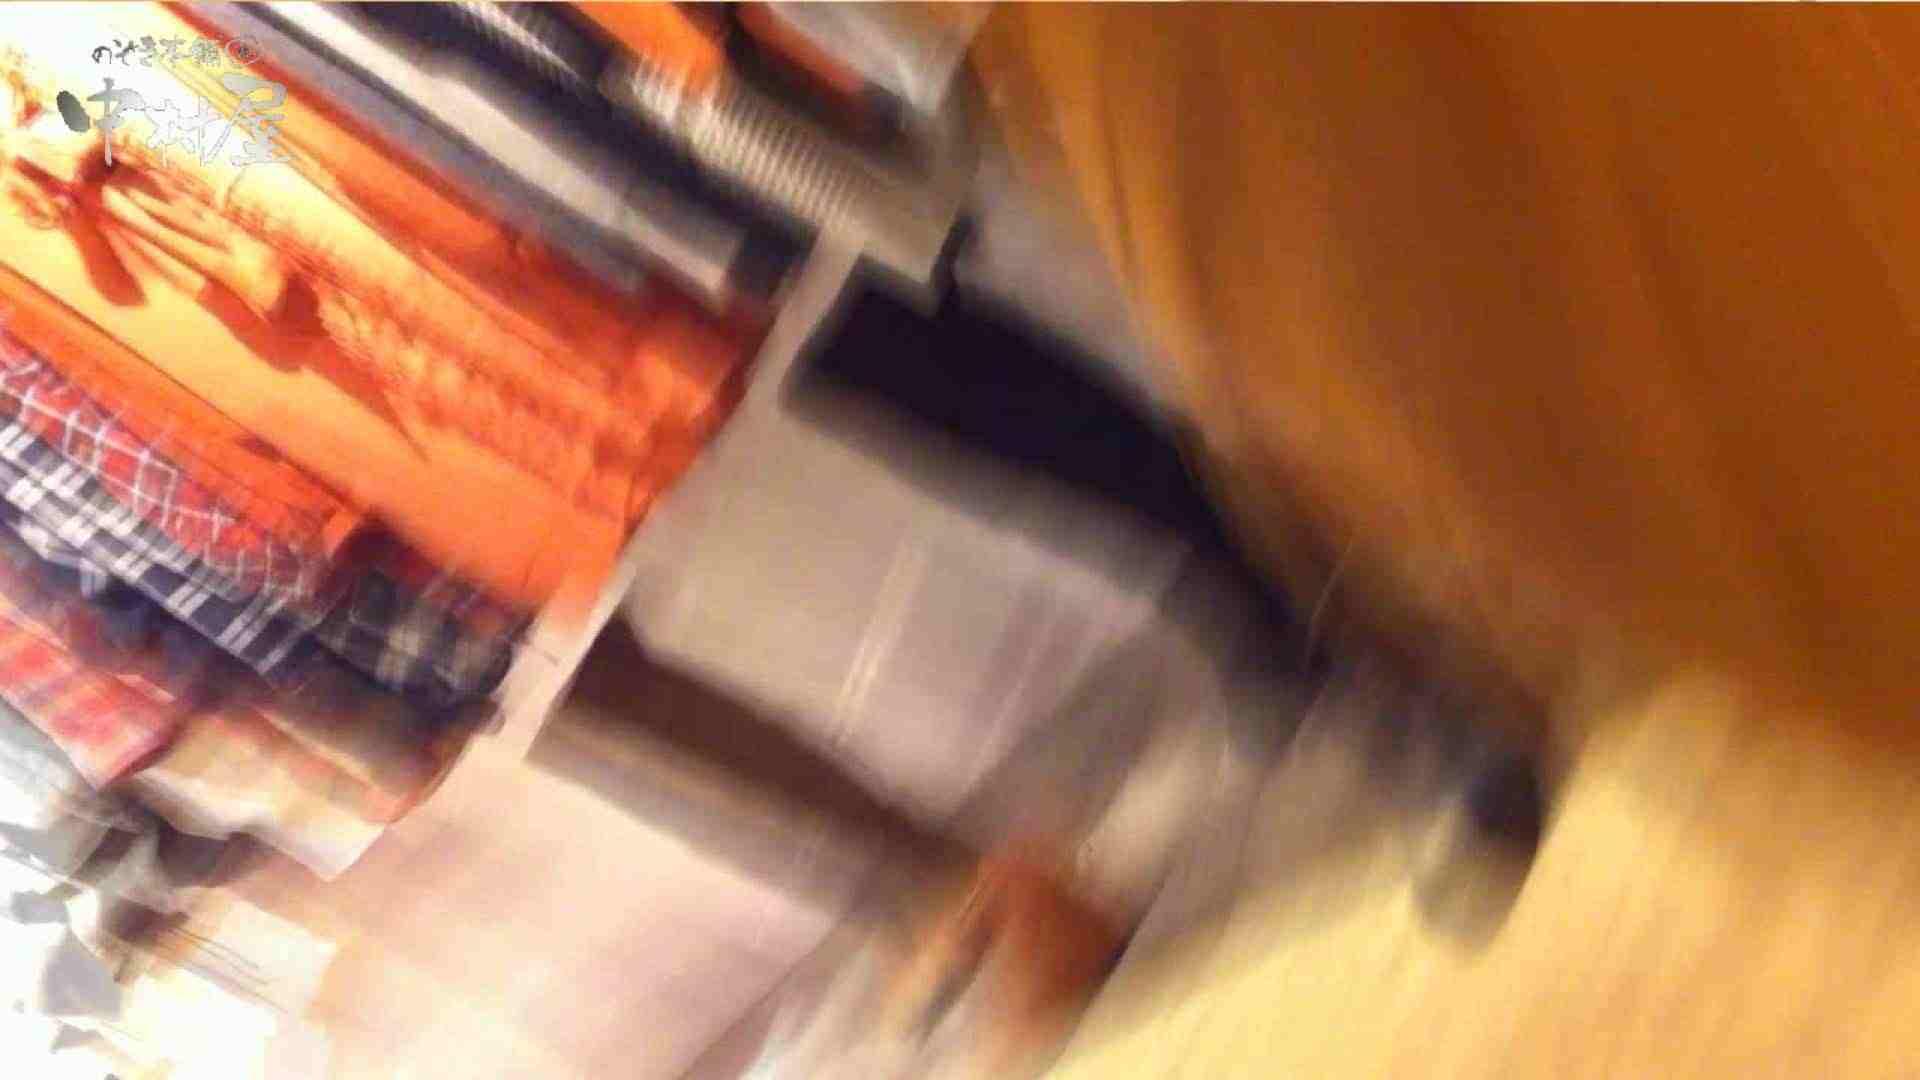 vol.84 美人アパレル胸チラ&パンチラ 帽子オネェさんに胸元アタック! チラ 盗撮オマンコ無修正動画無料 51PICs 33